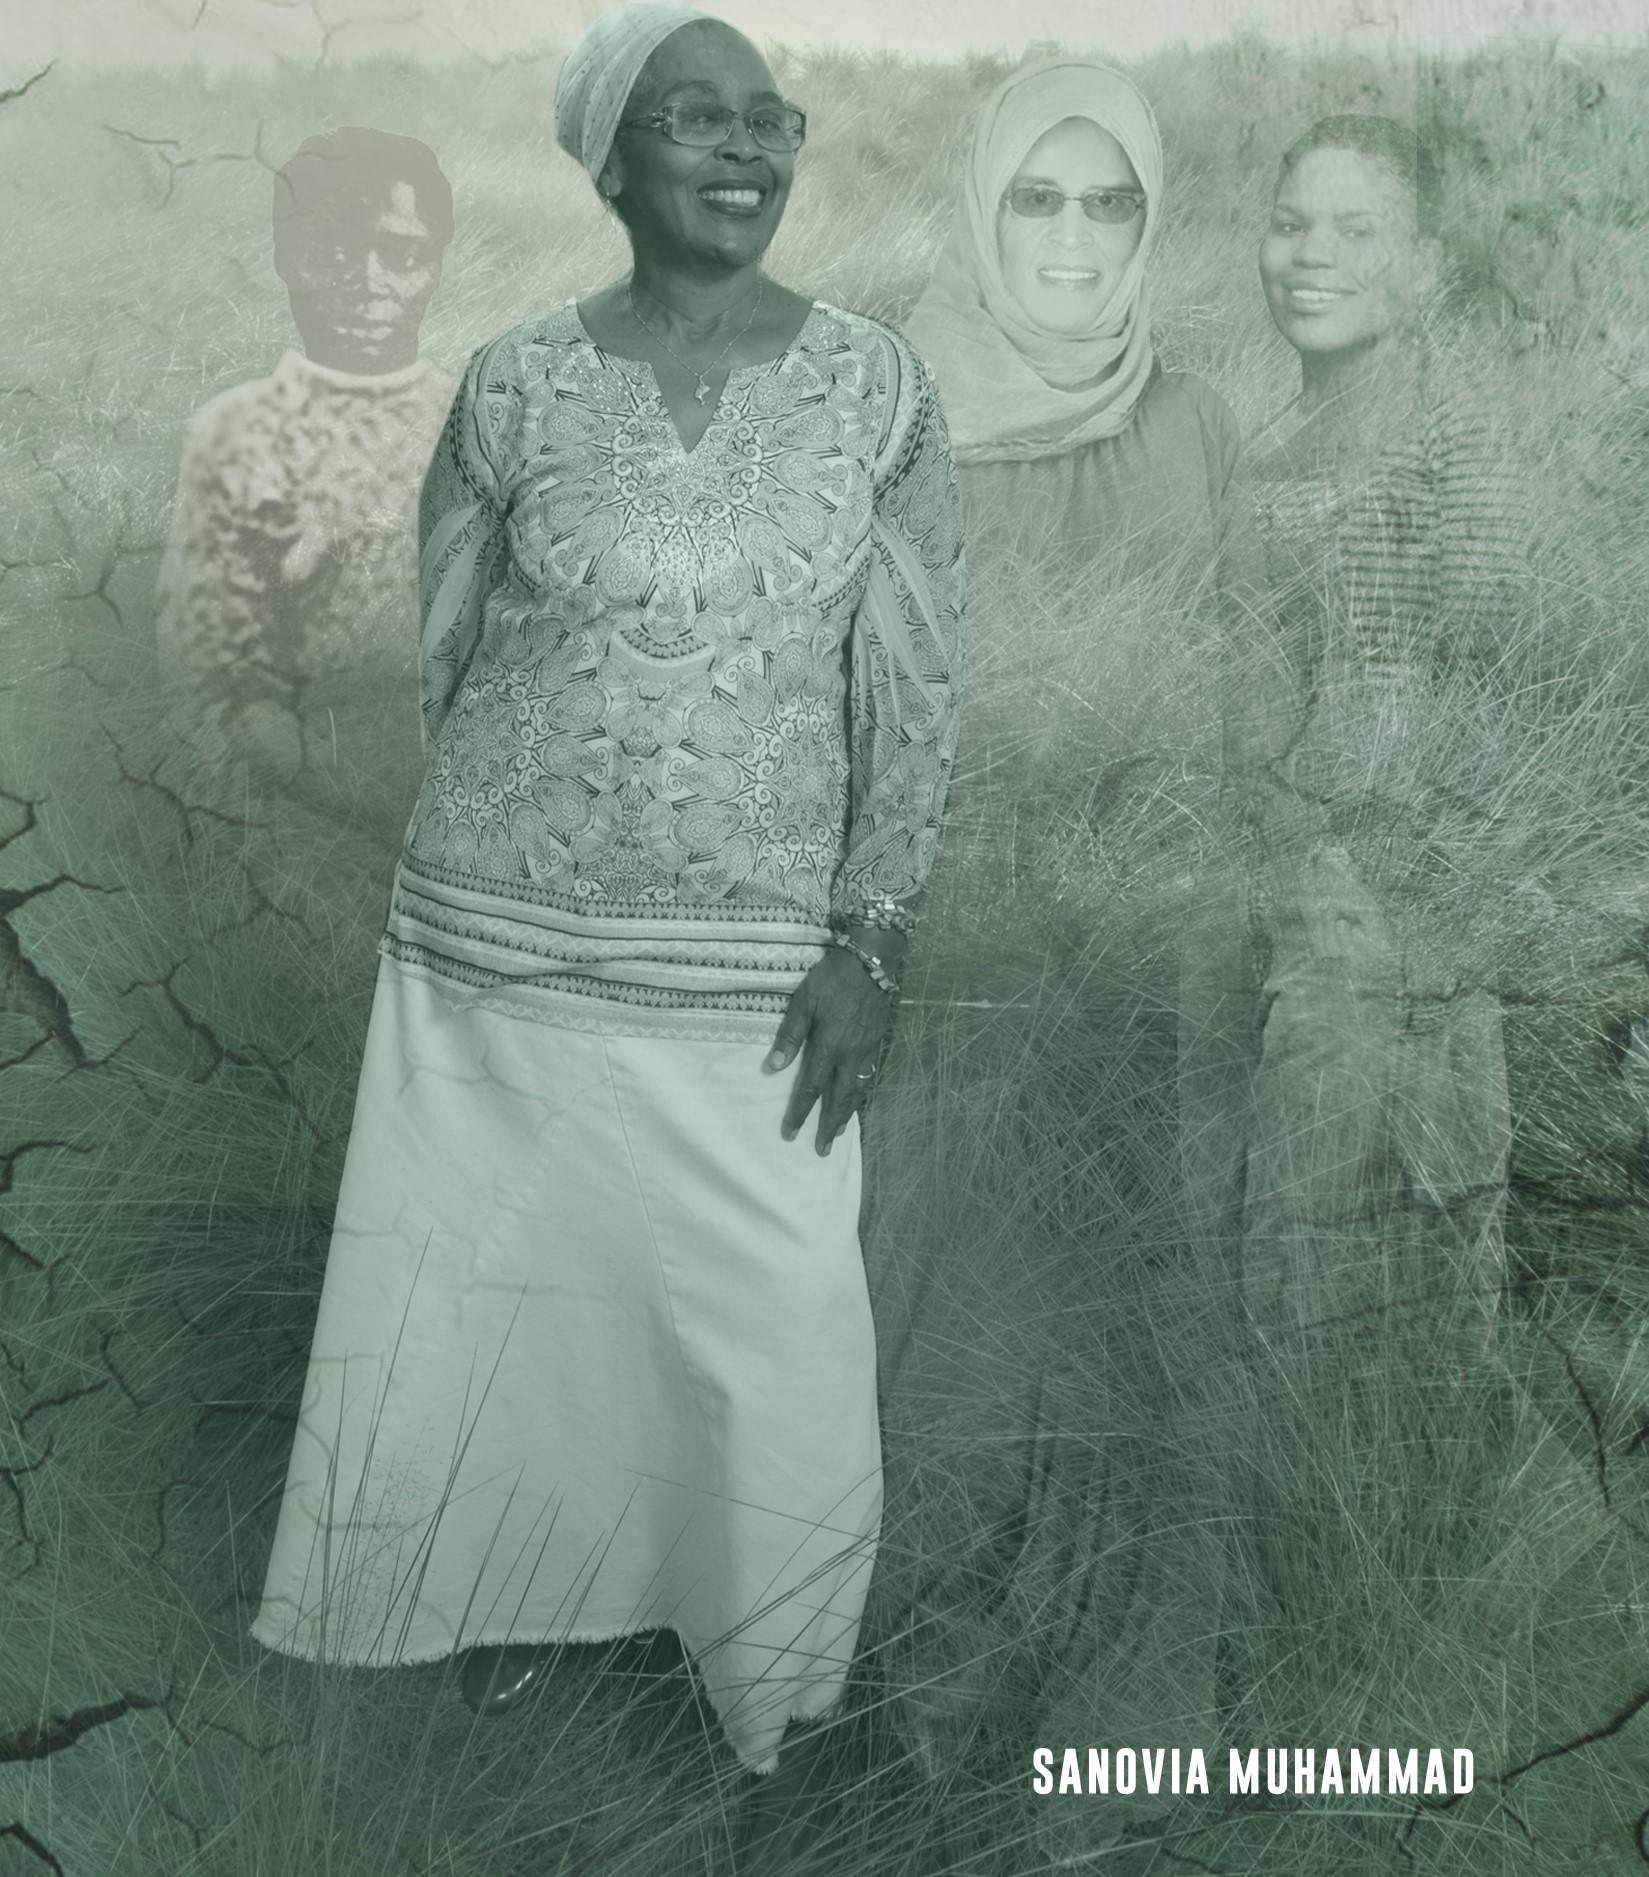 Sanovia Muhammad